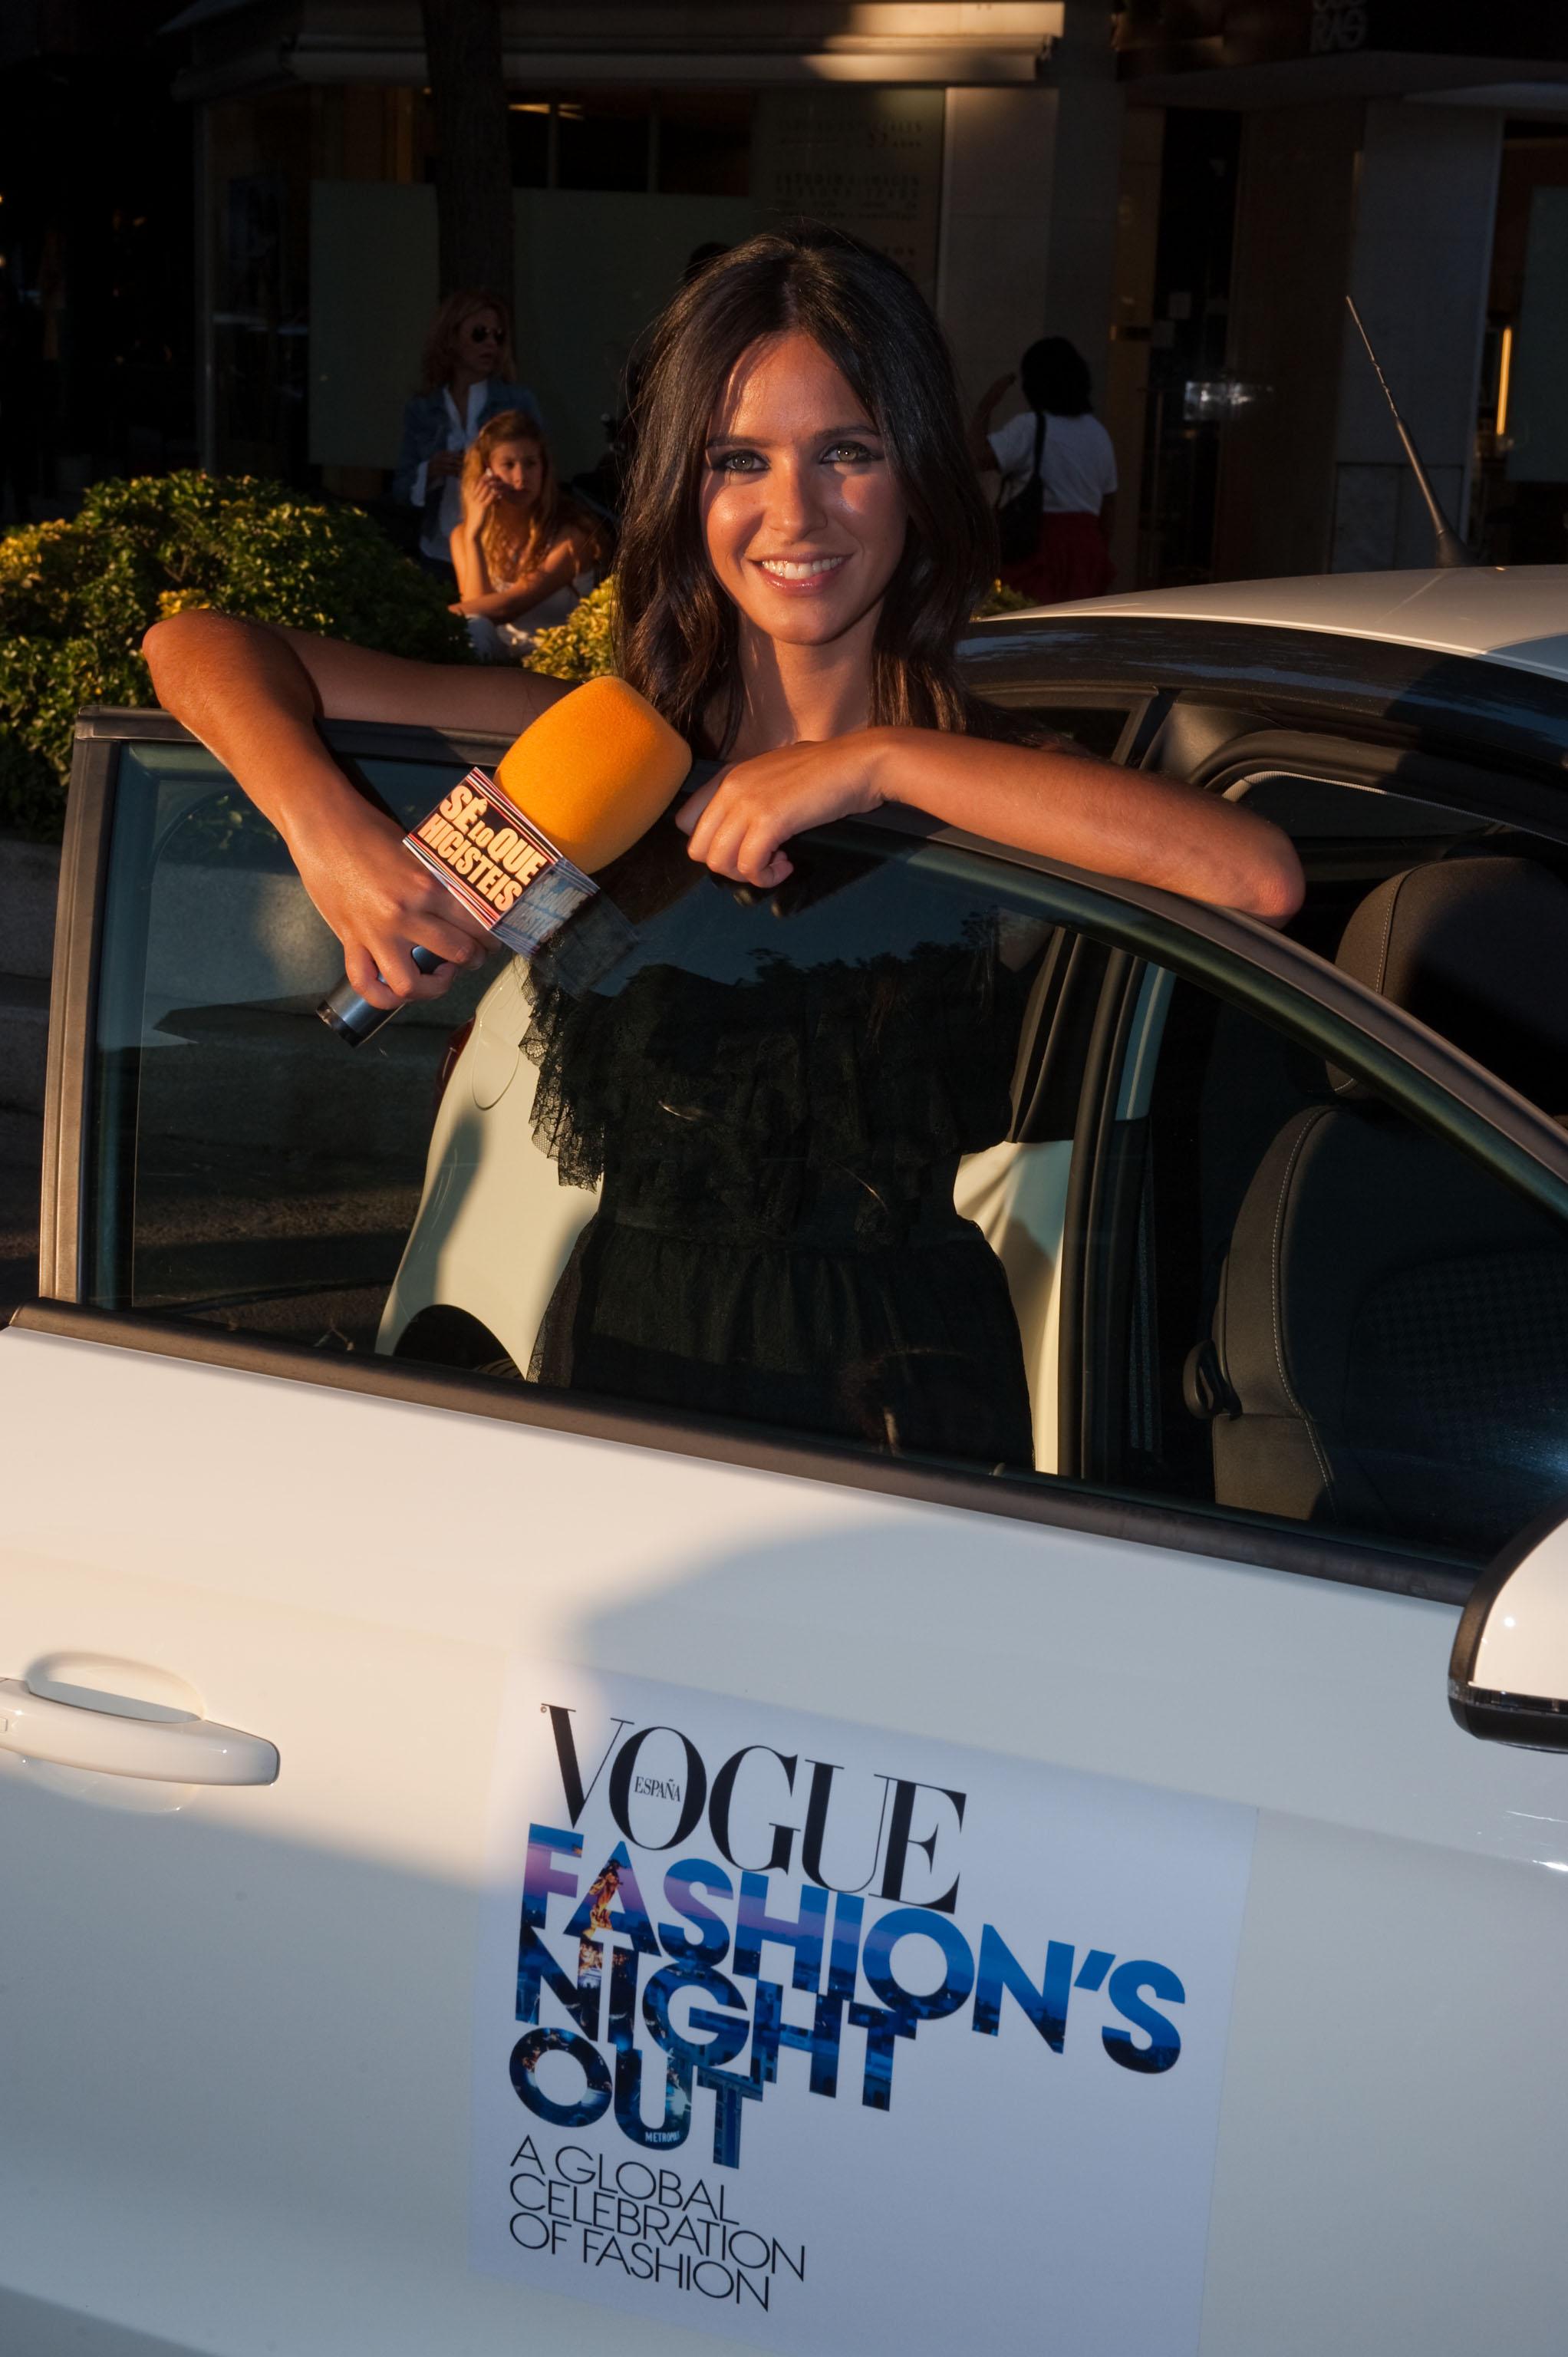 Paula Prendes, Vogue Fashion Night Out